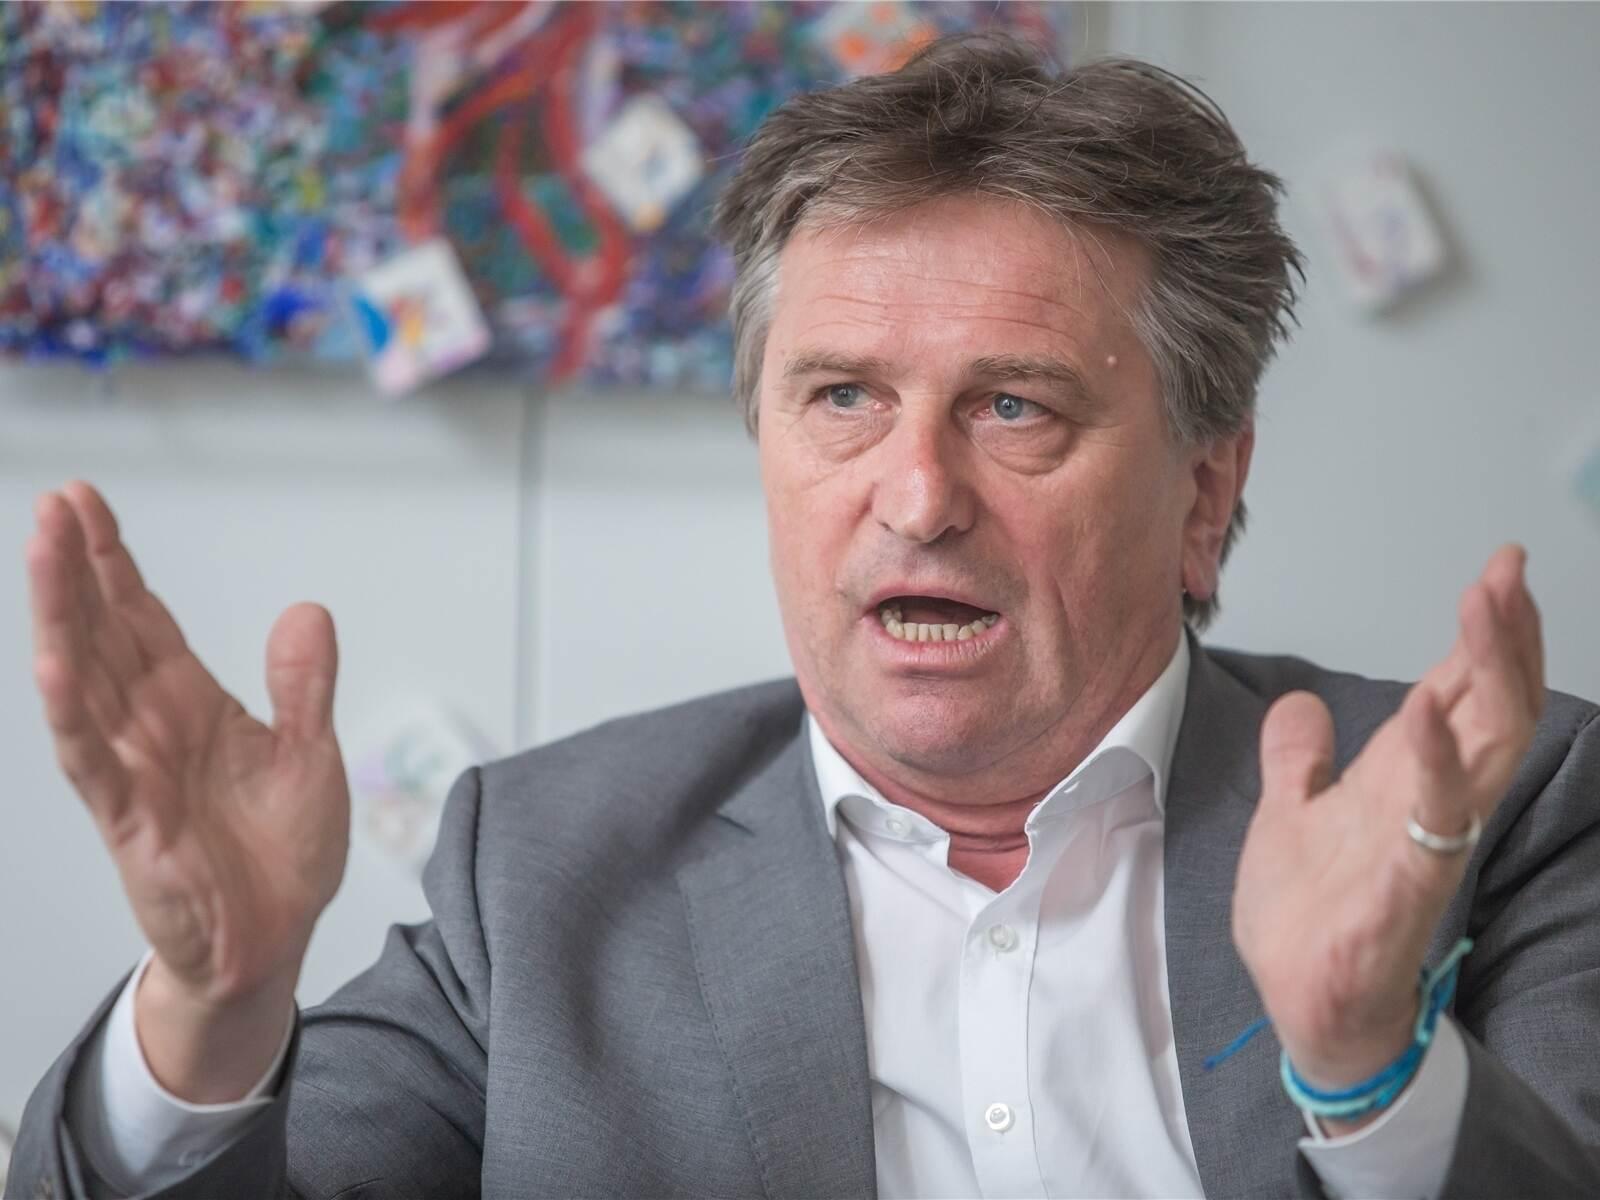 Lucha hält an Impfstrategie fest - Baden-Württemberg...